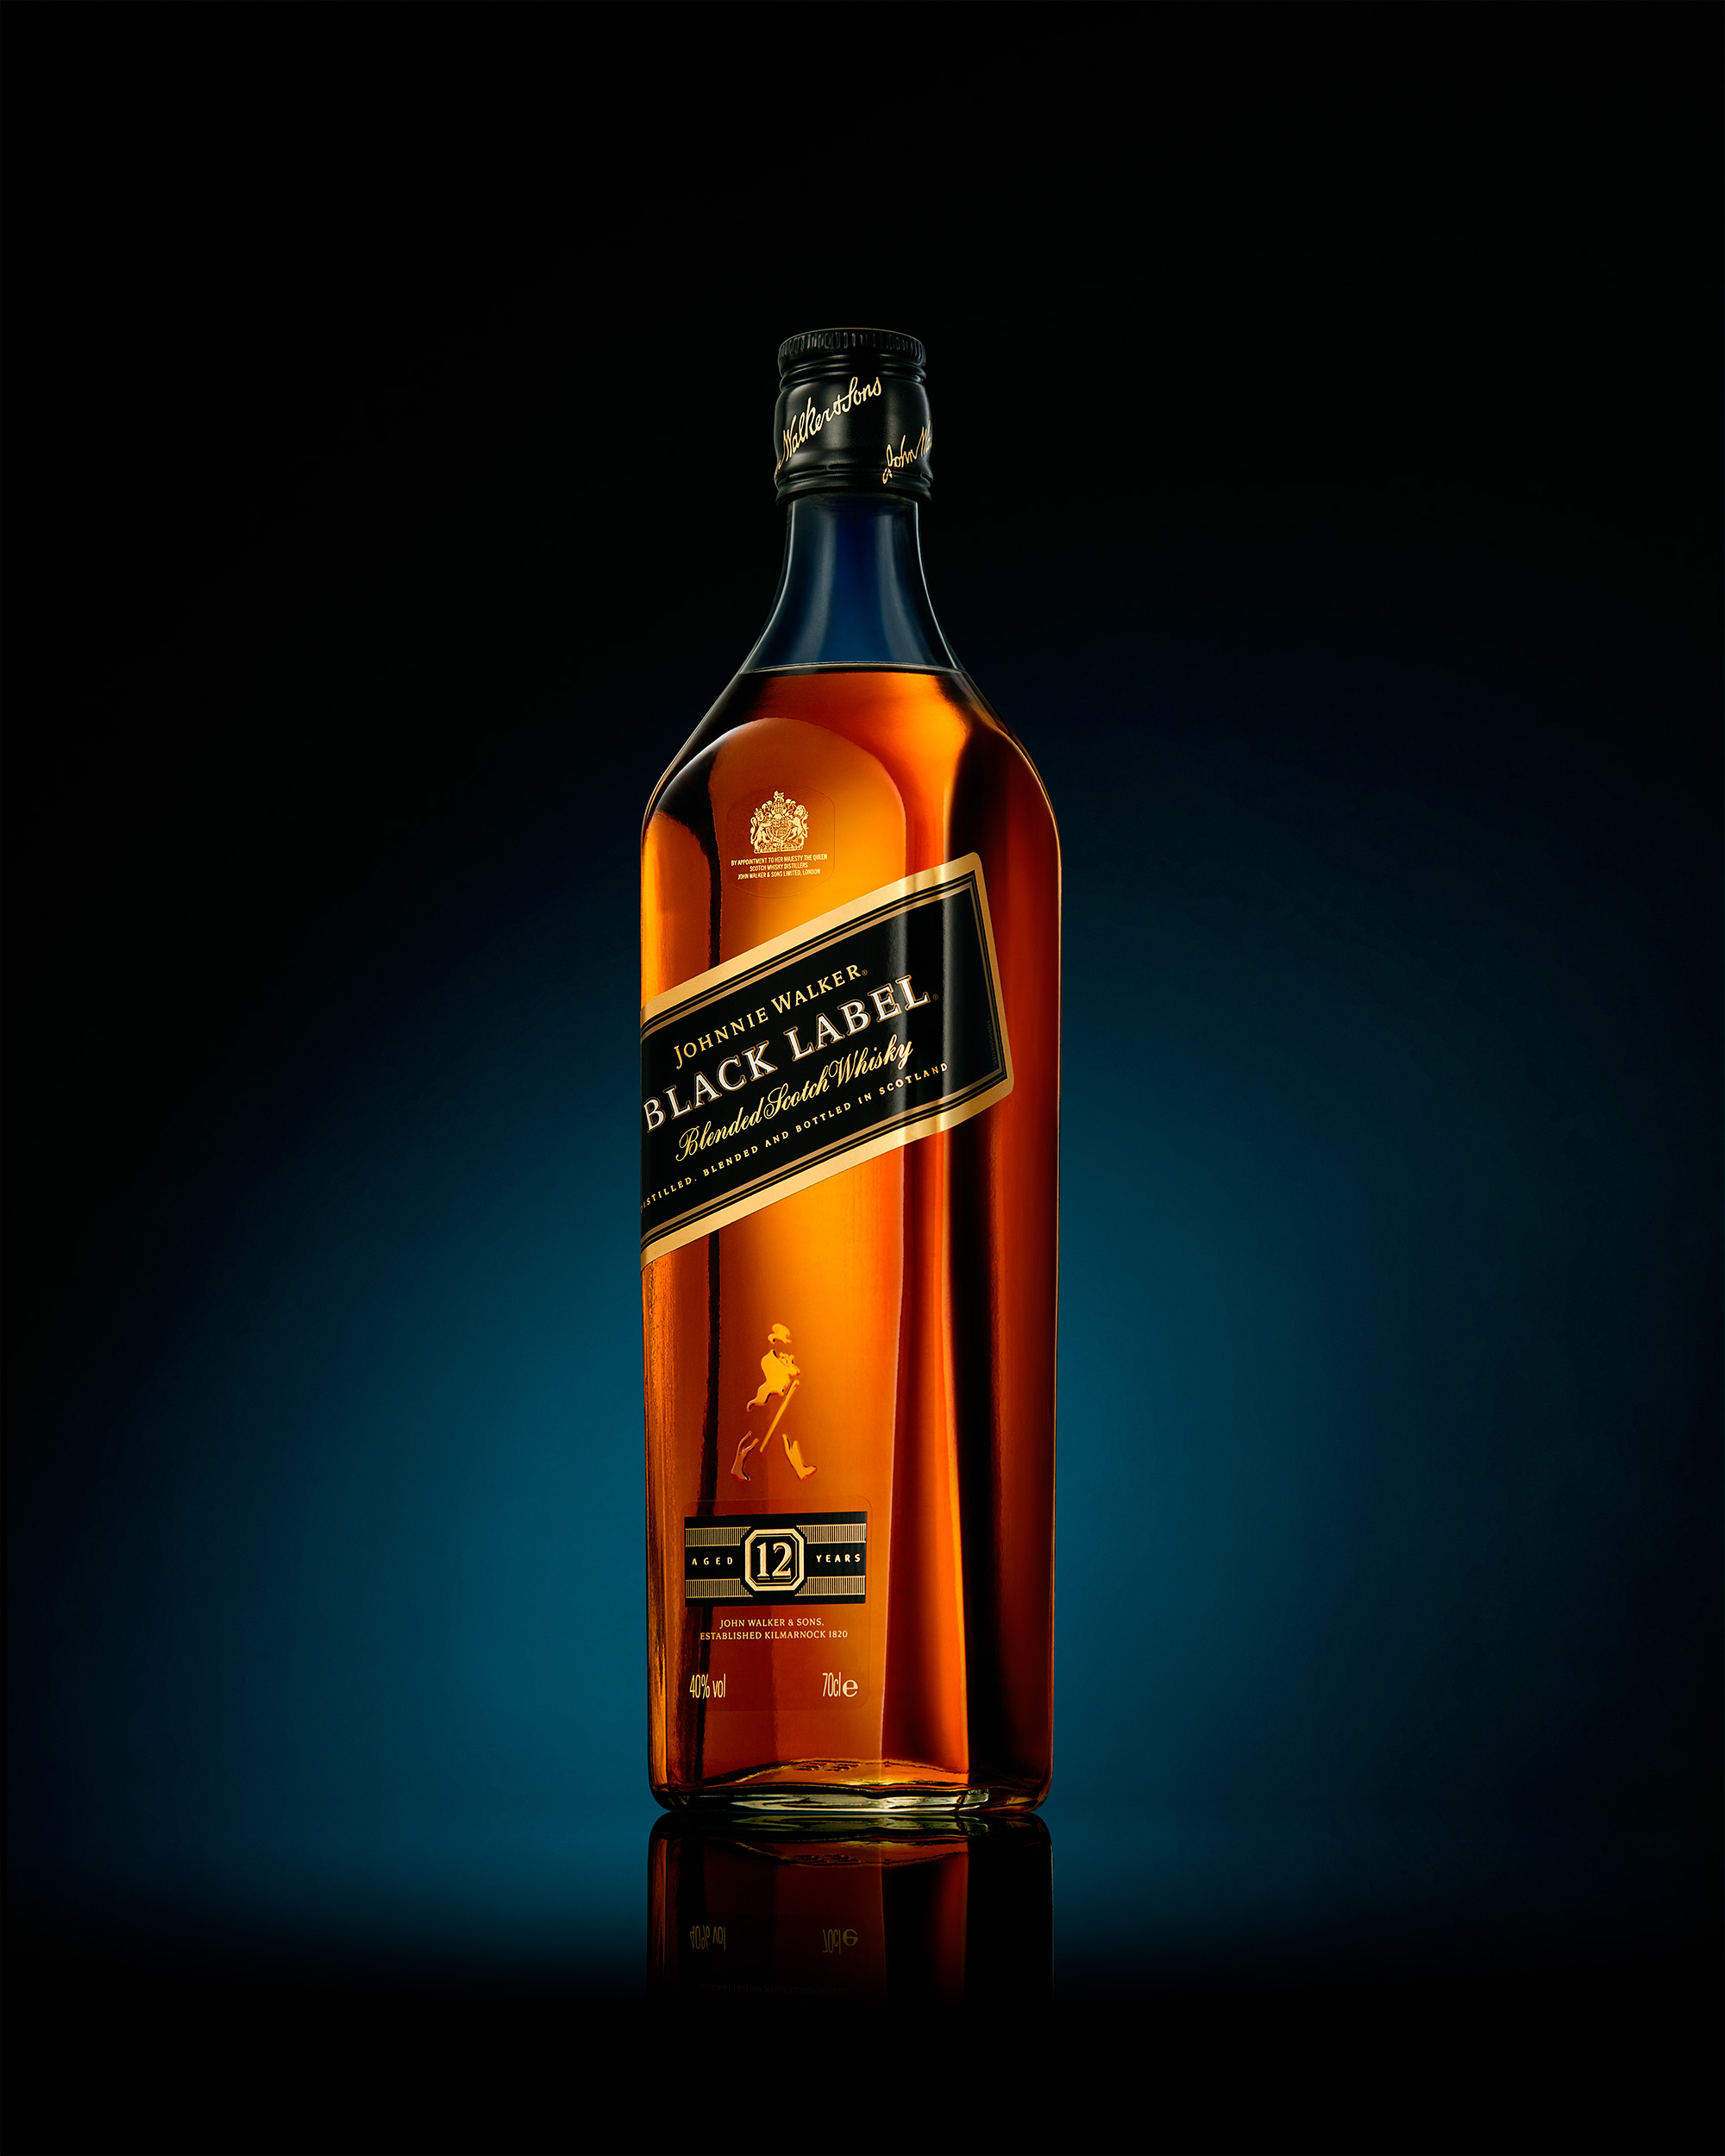 2018-01_JohnnyWalker_Bottle_sm_sRGB.jpg